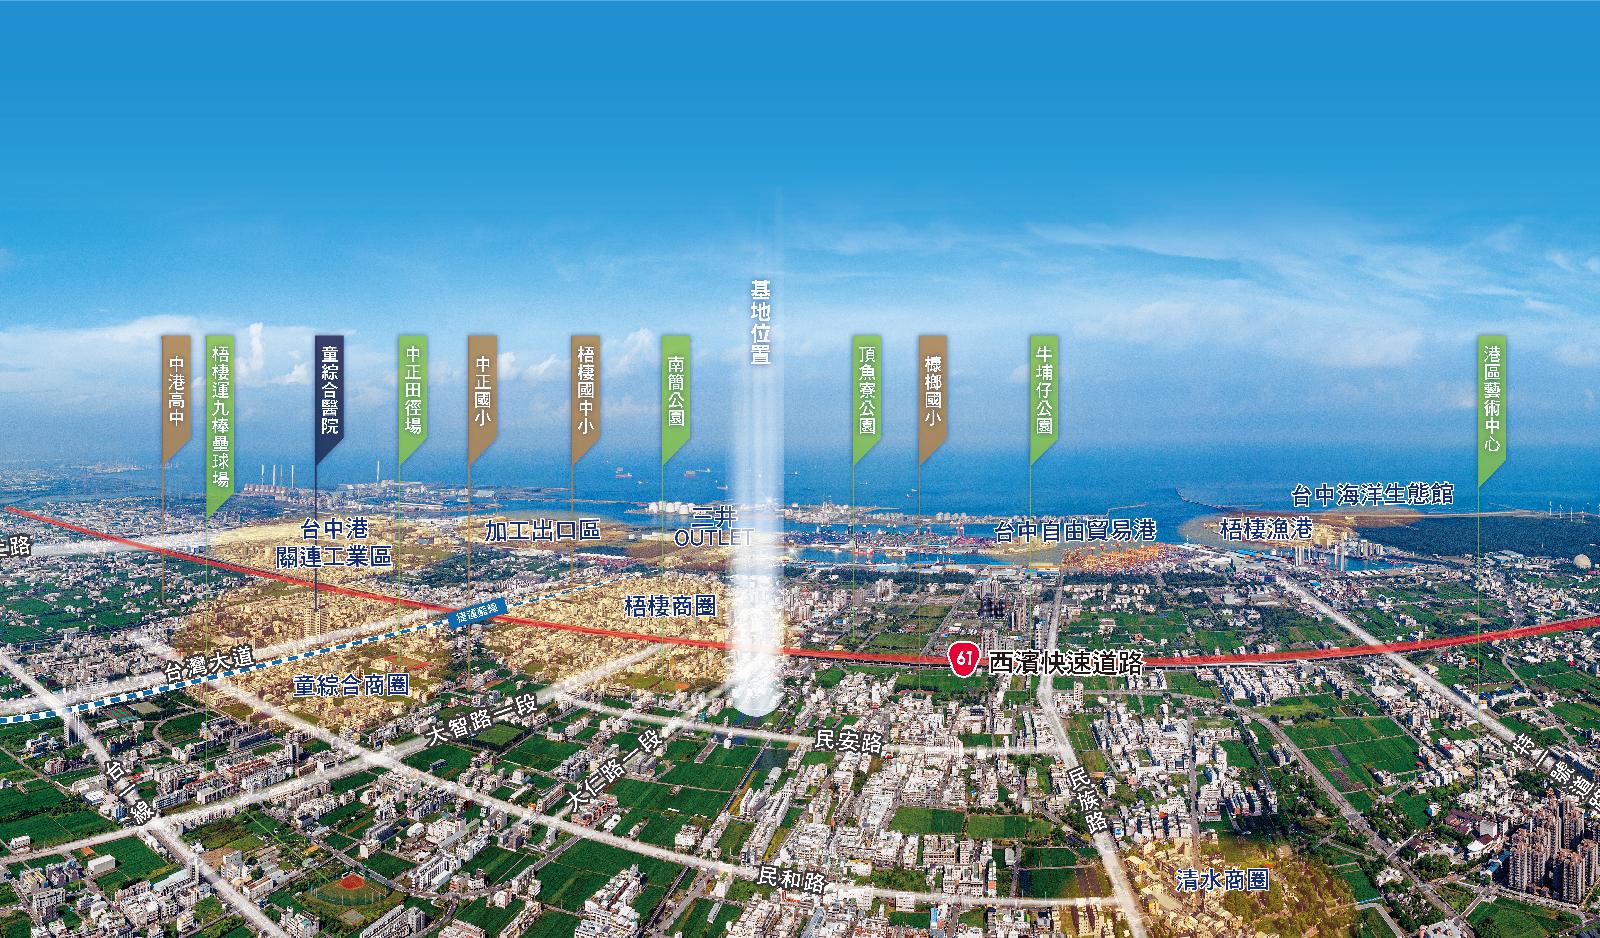 GRAND CITY 雙港起飛 繁華入席